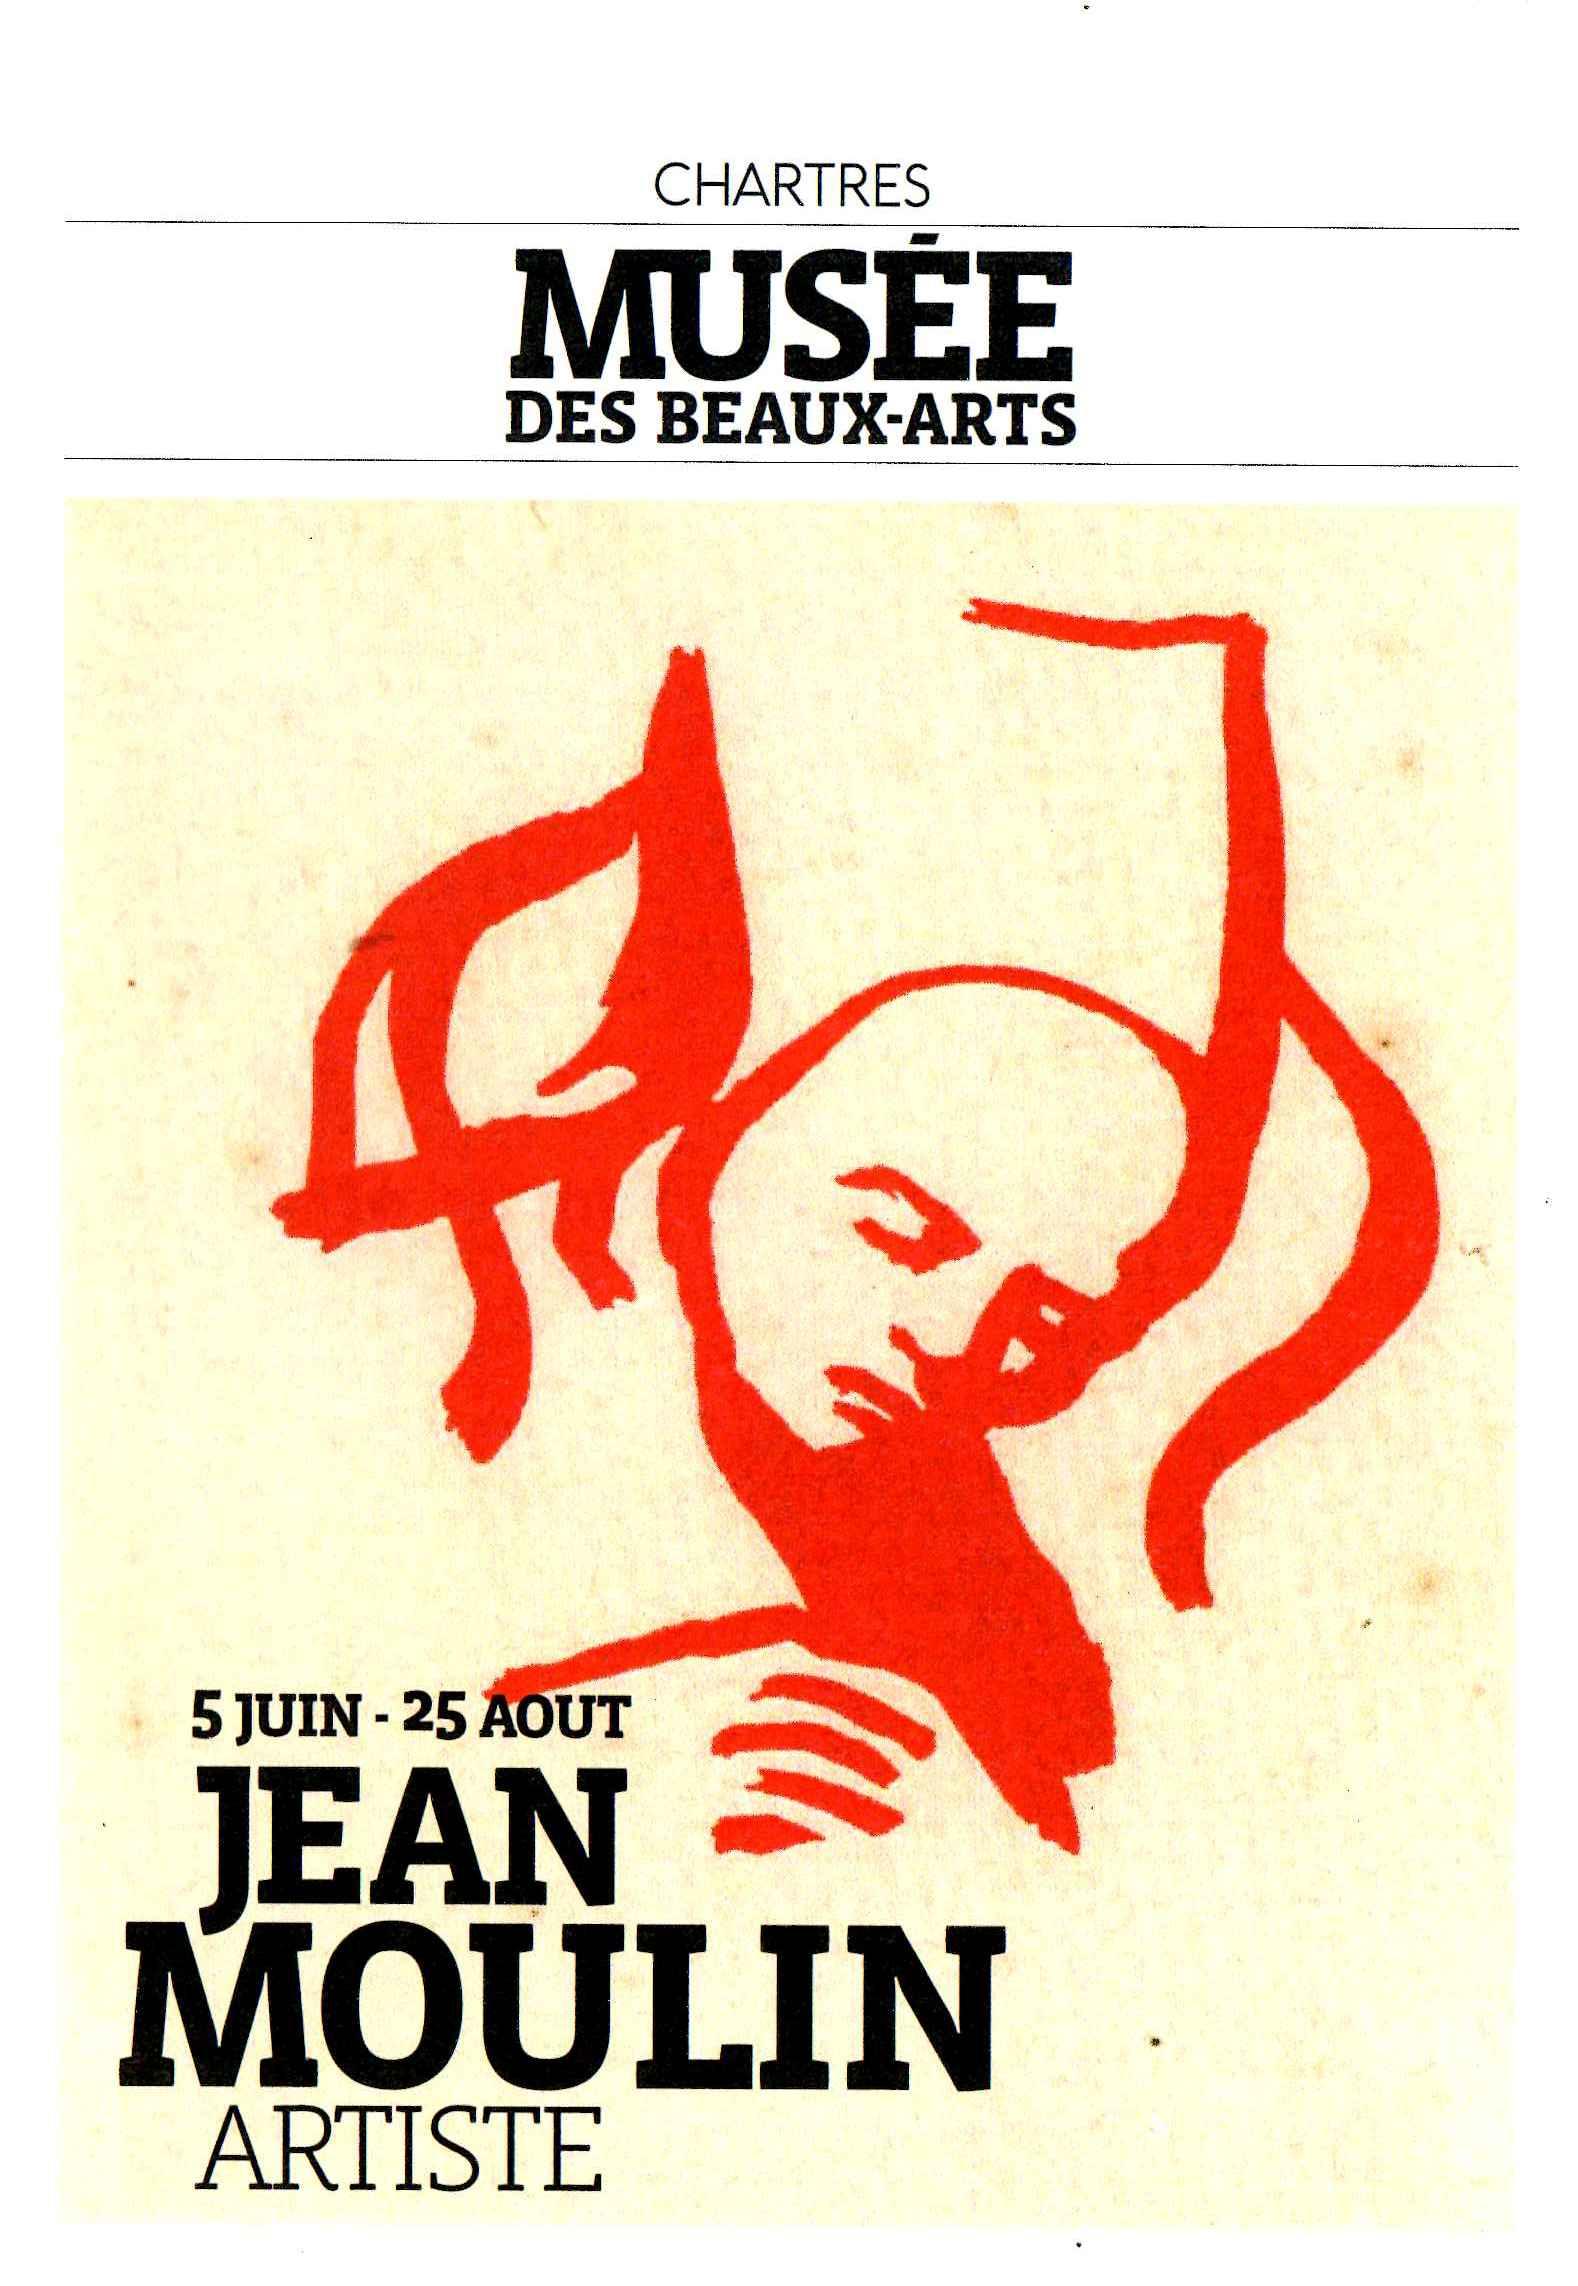 Expo Jean Moulin Artiste [Affiche]